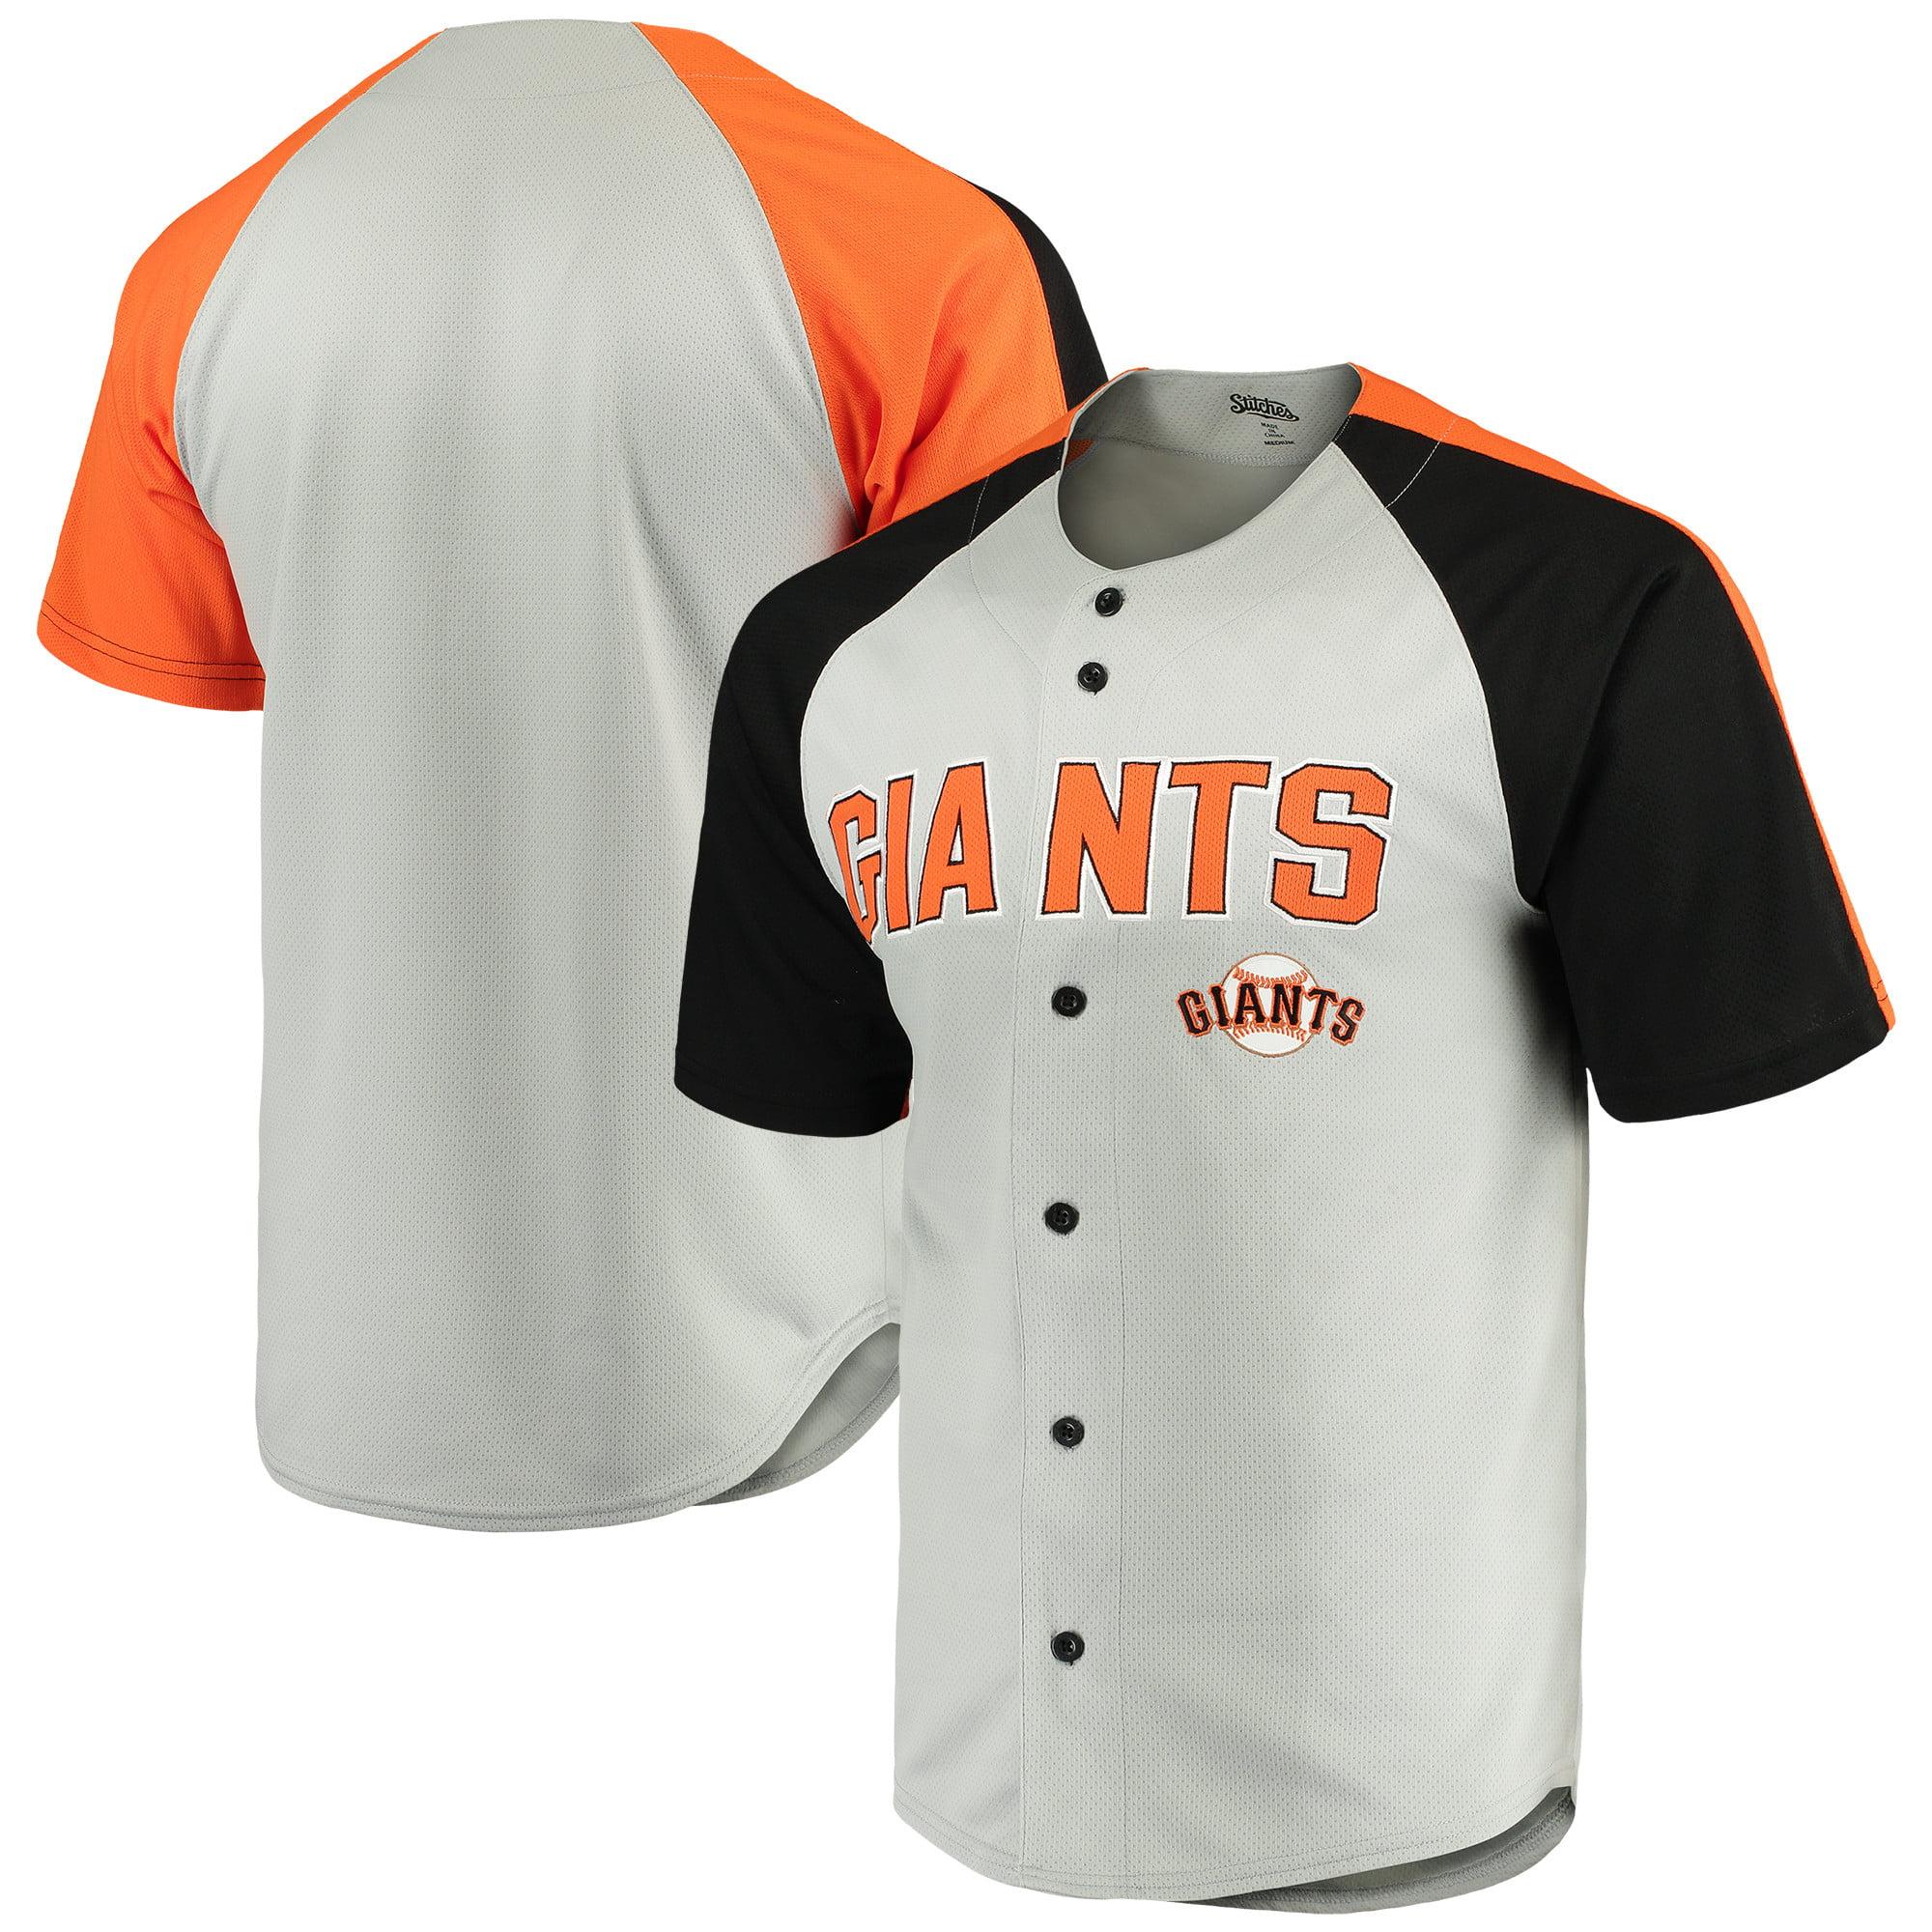 San Francisco Giants Stitches Lightweight Mesh Jersey - Gray/Black